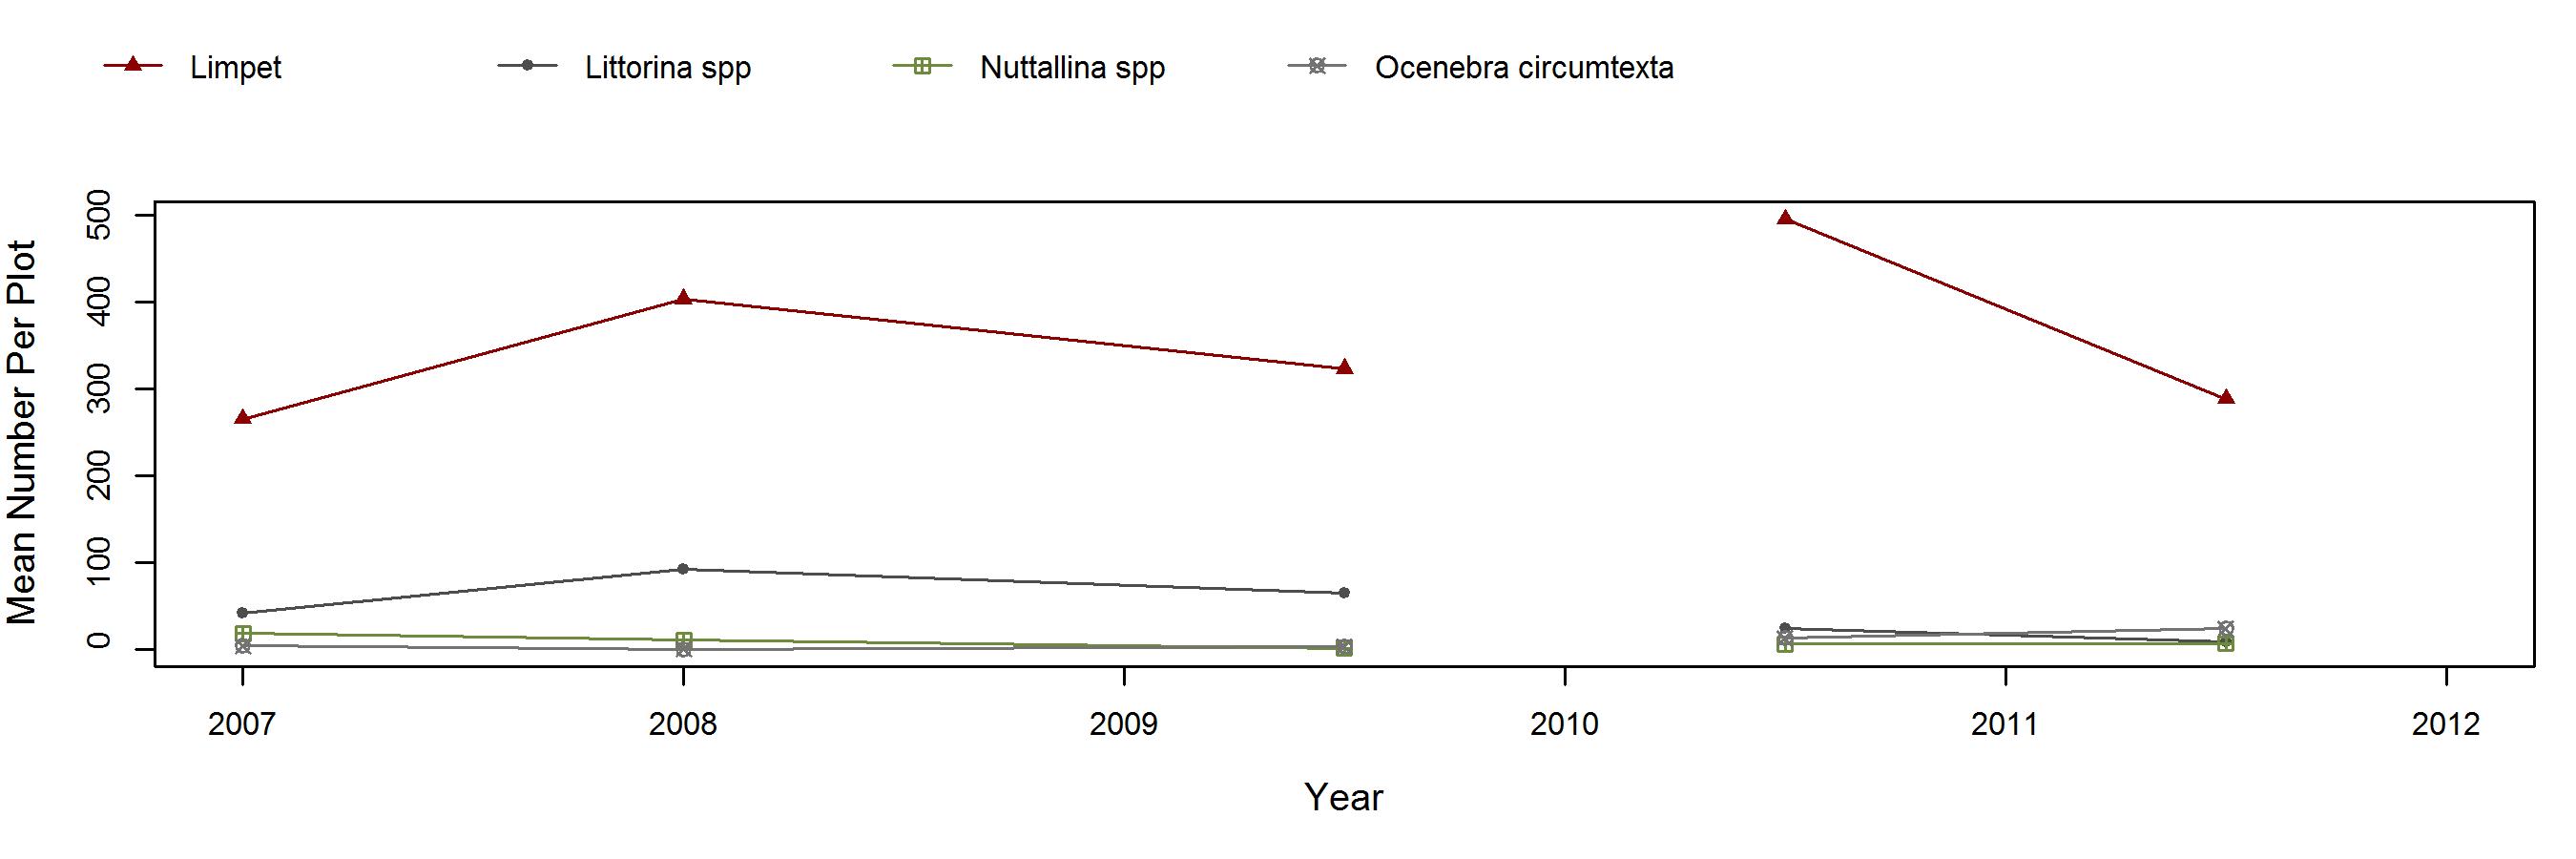 Scorpion Rock Tetraclita trend plot